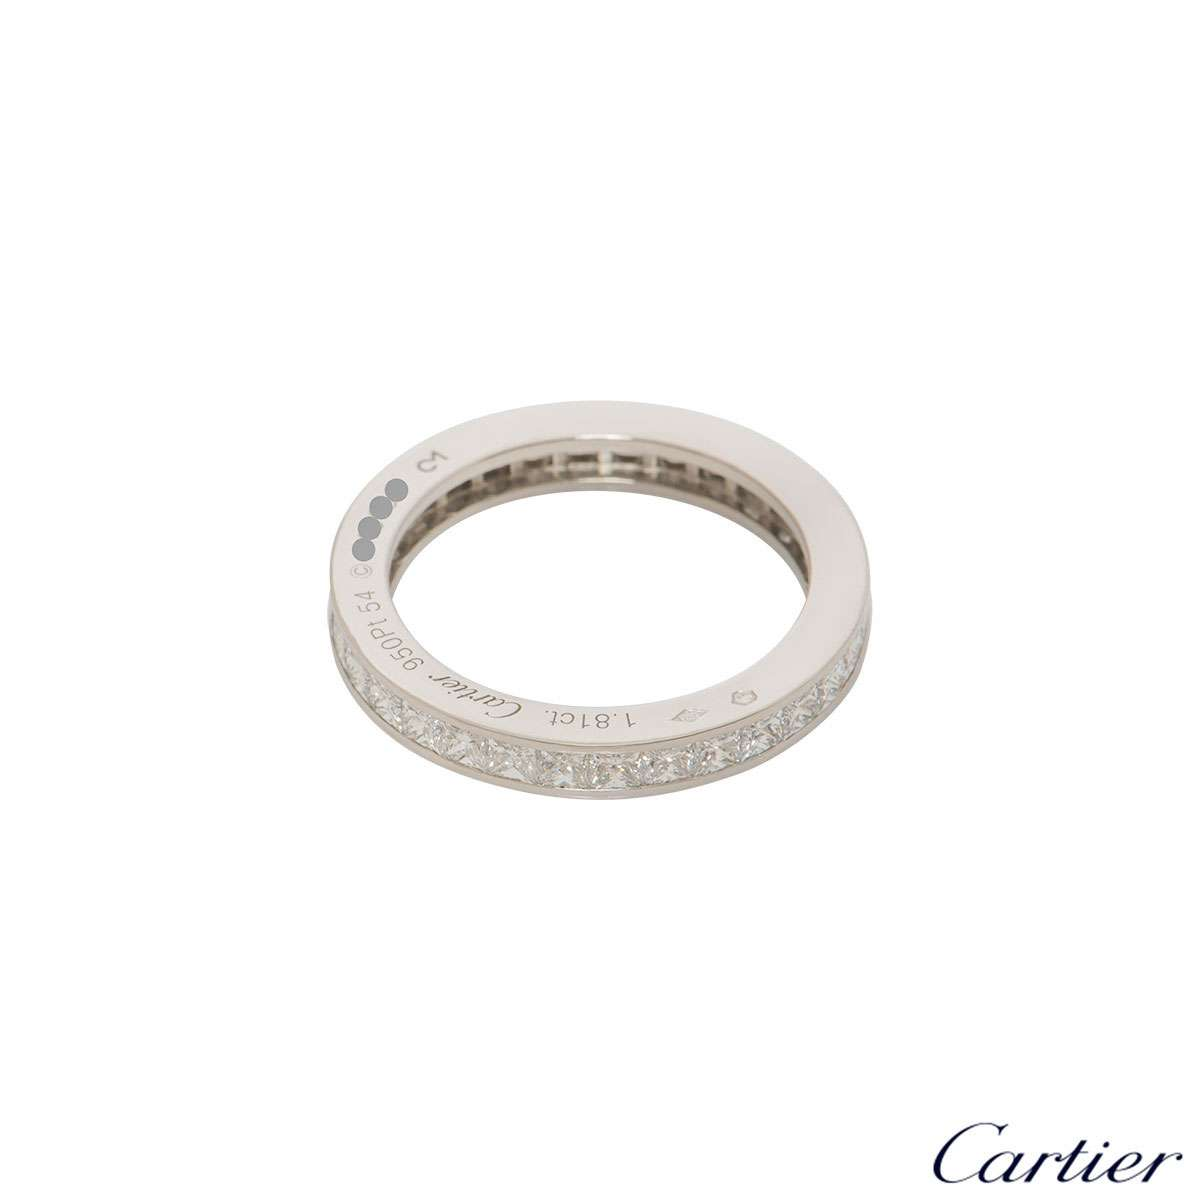 Cartier Platinum Diamond Eternity Ring 1.81ct